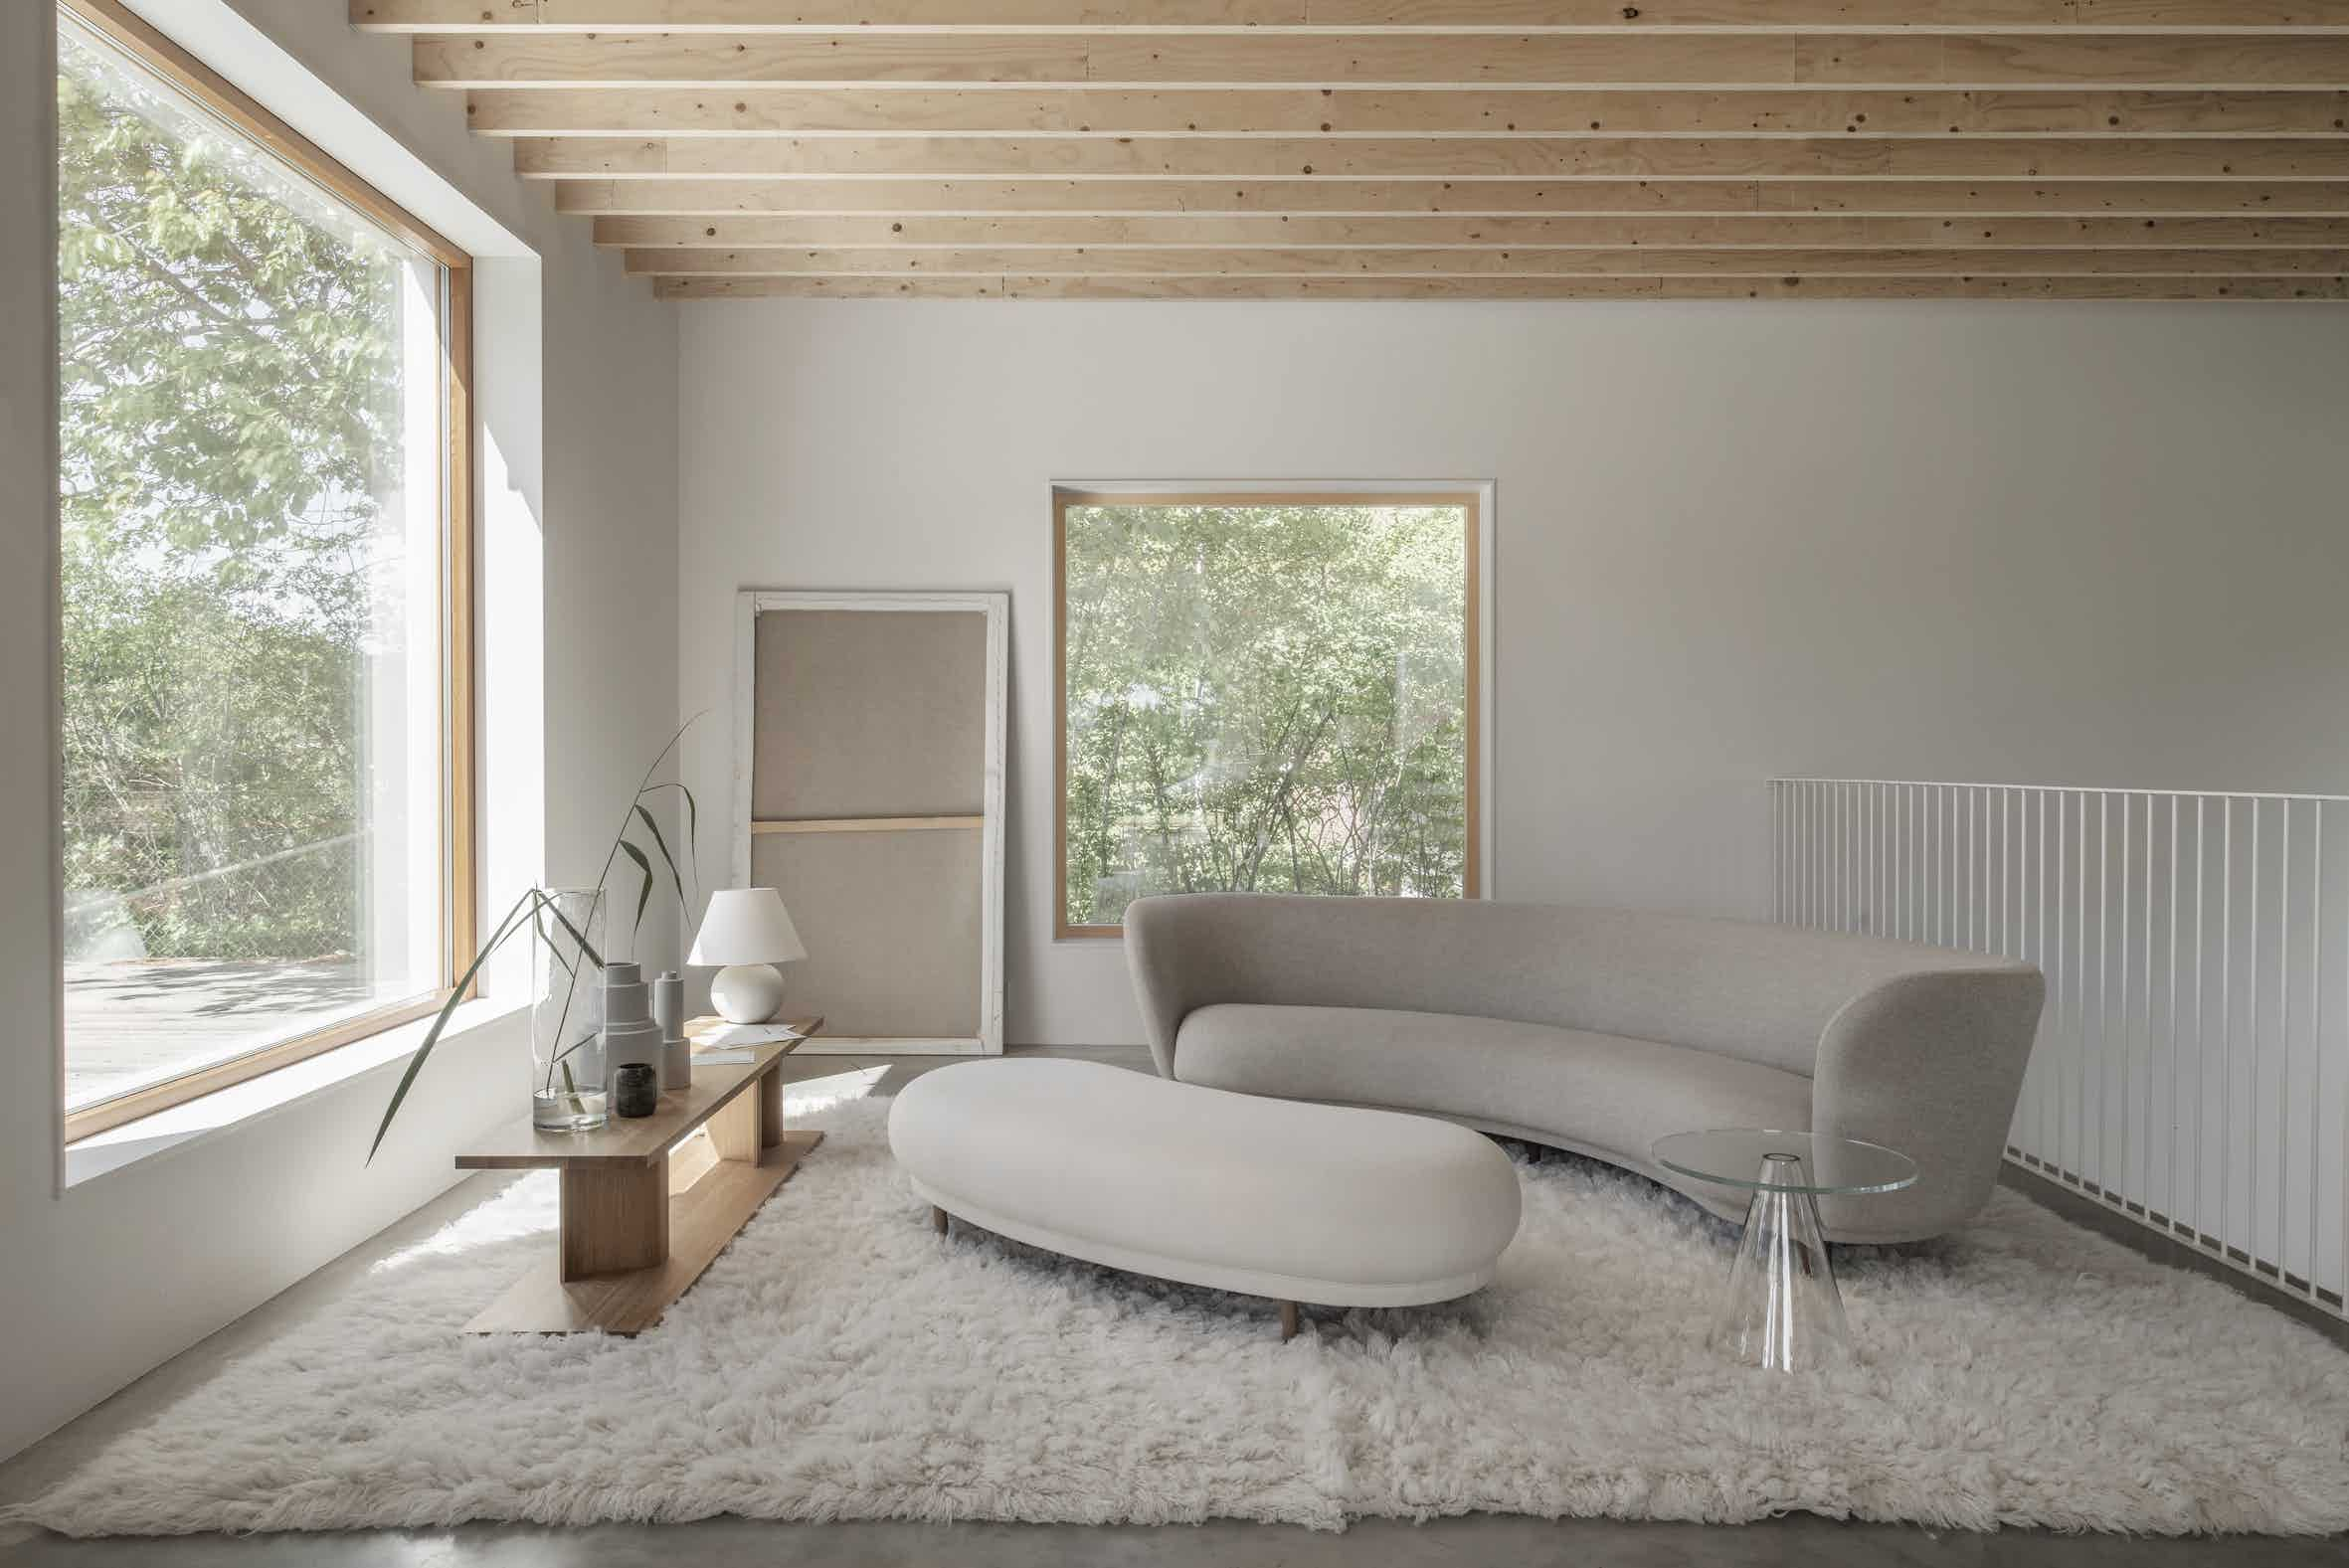 Dandy-sofa-by-massproductions-haute-living